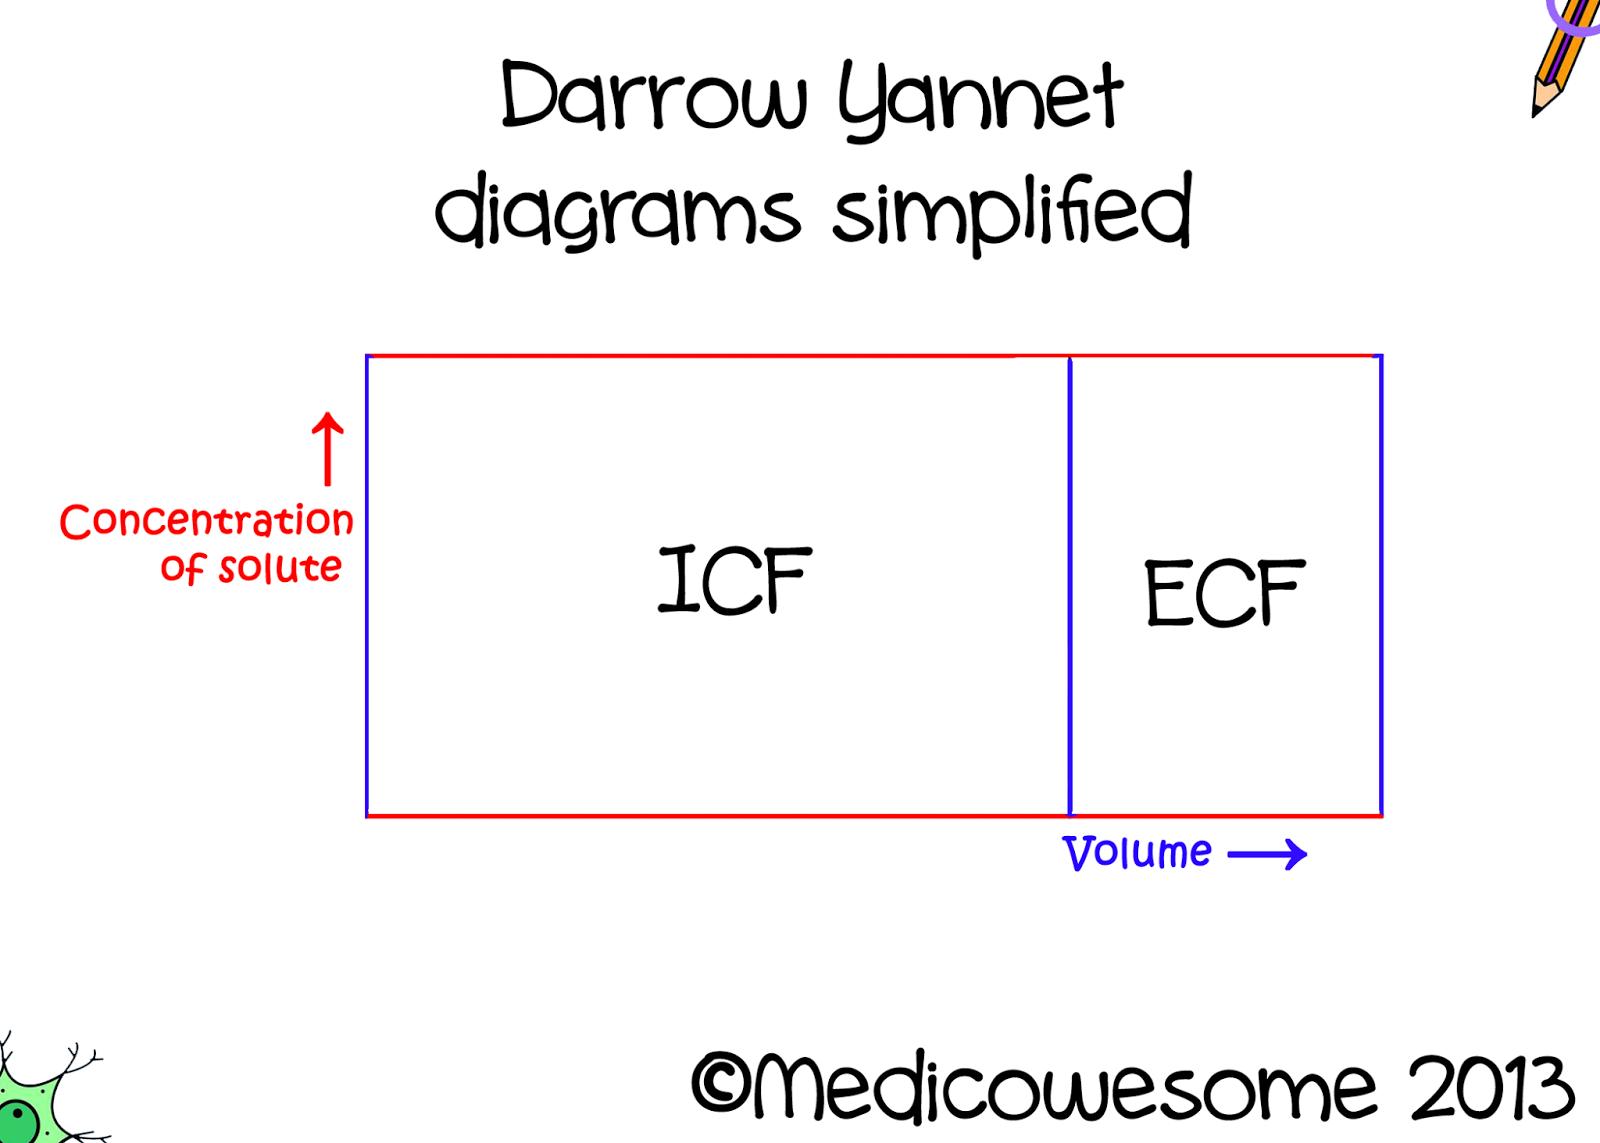 medium resolution of darrow yannet diagrams simplified